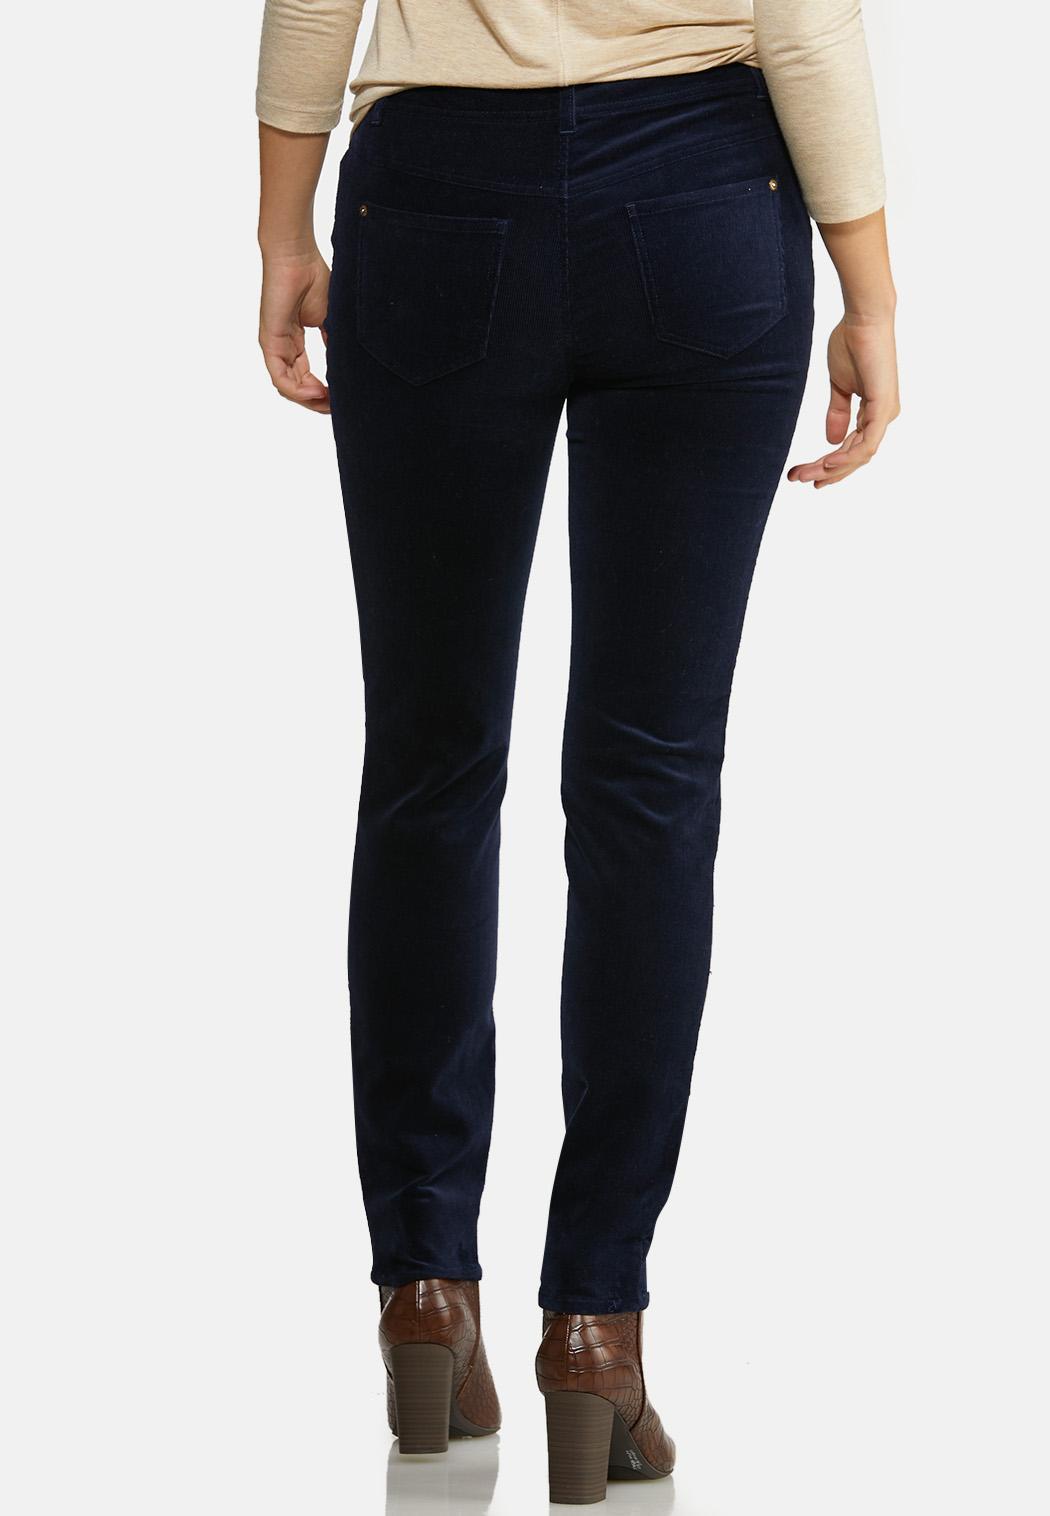 Corduroy Slim Pants (Item #43993222)